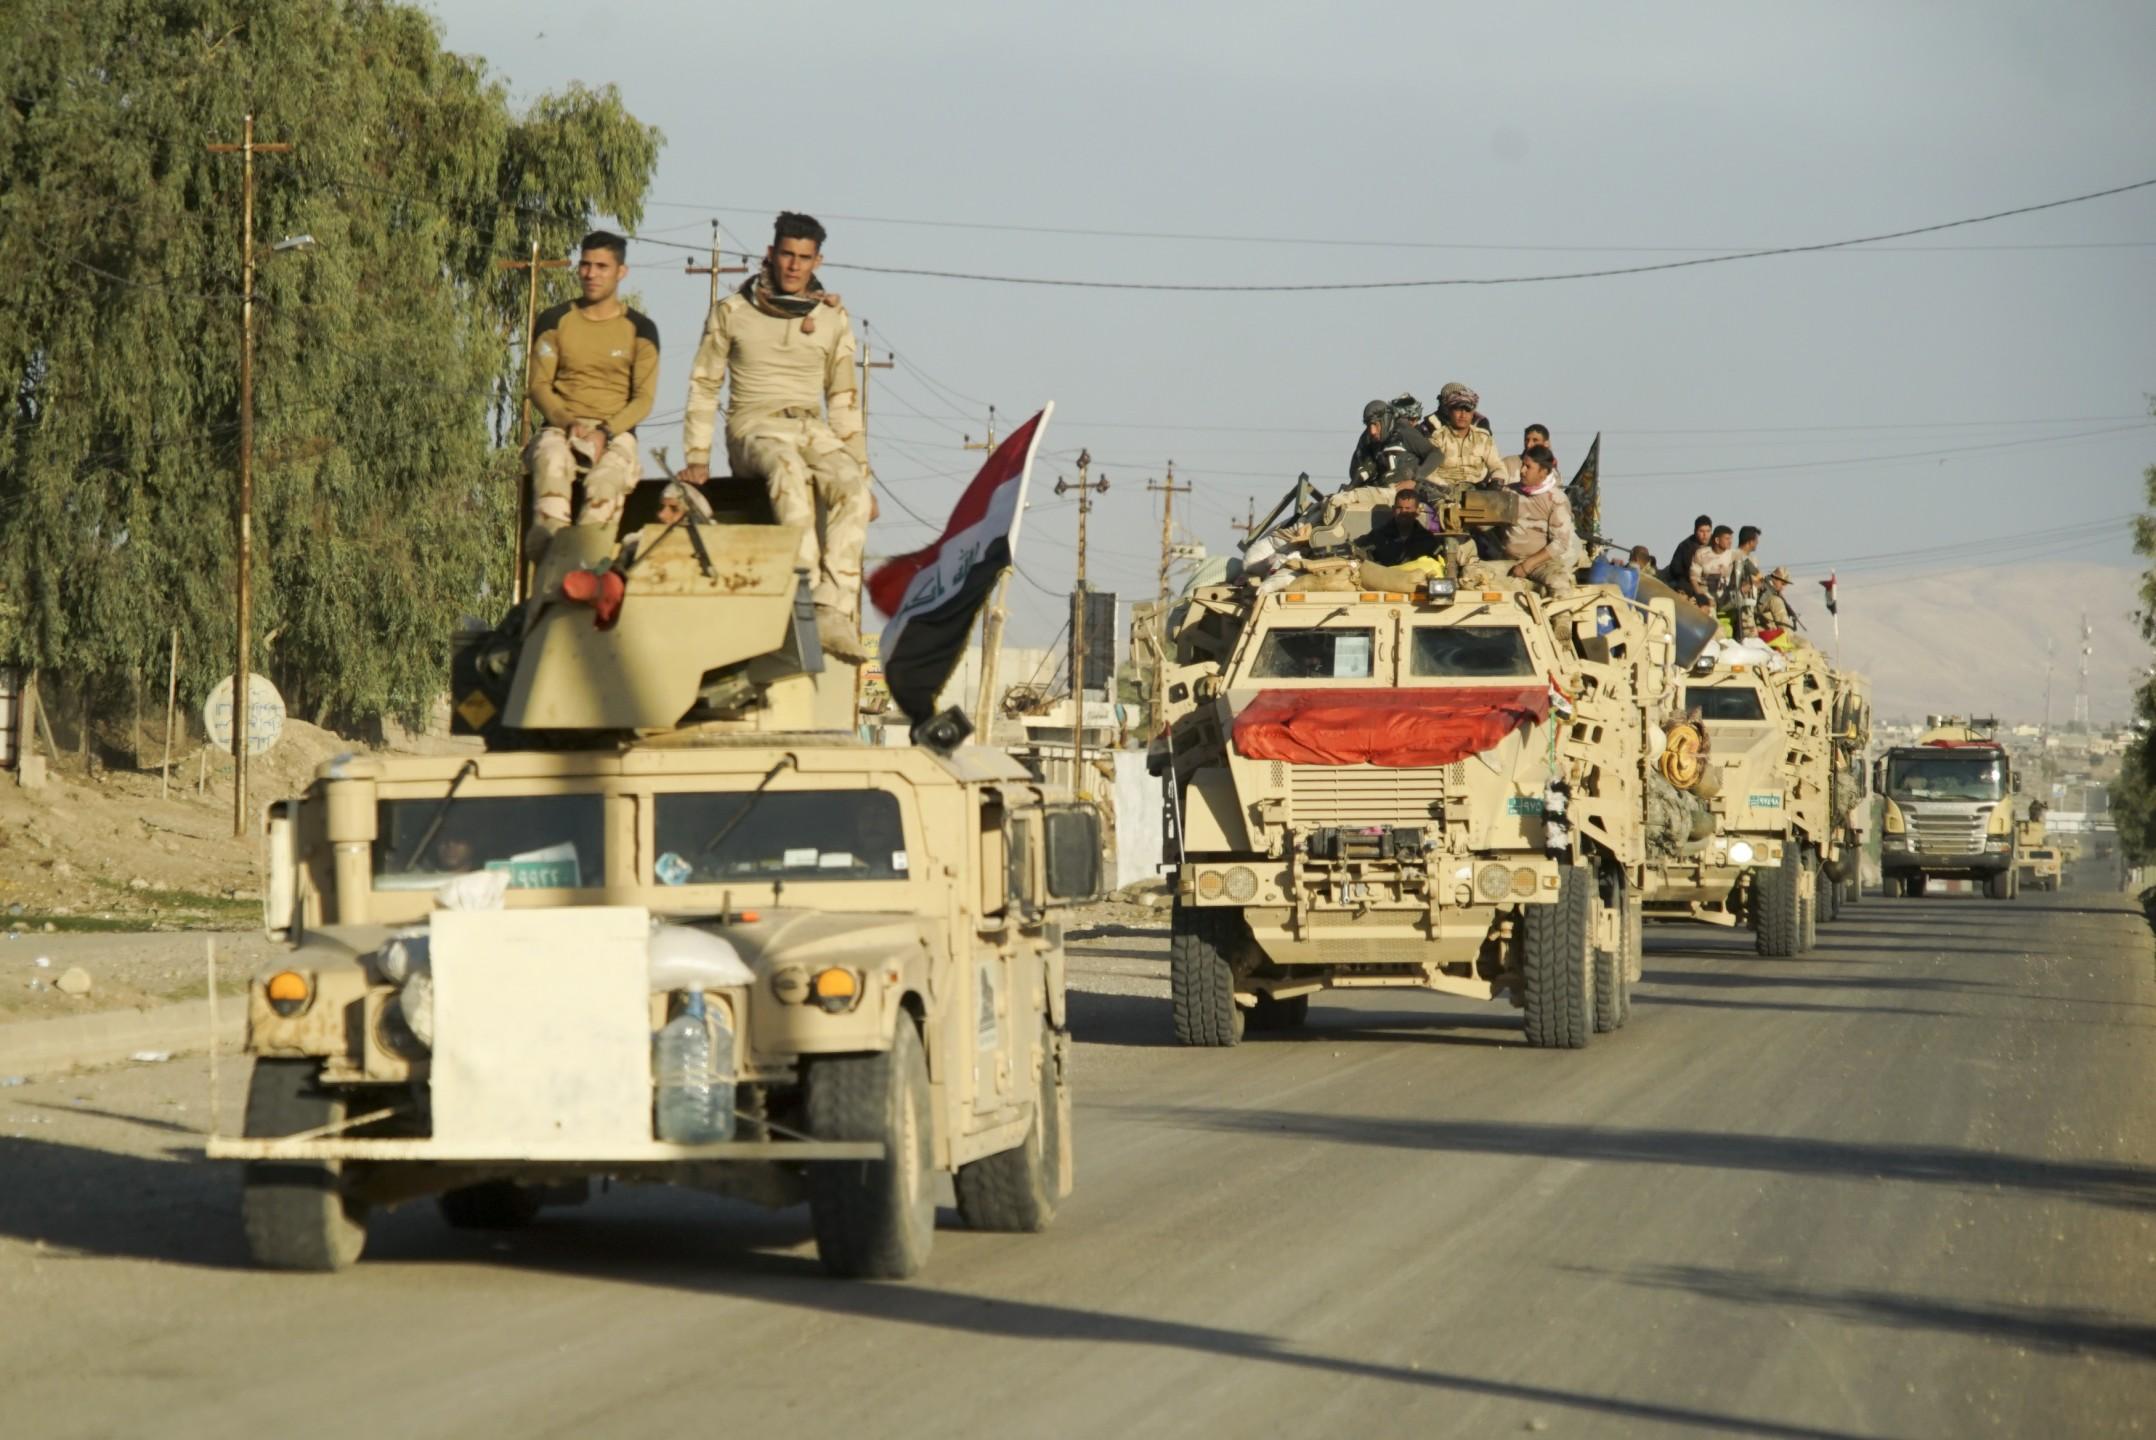 iraqi_army_convoy._mosul_northern_iraq_western_asia._17_november_2016.jpg